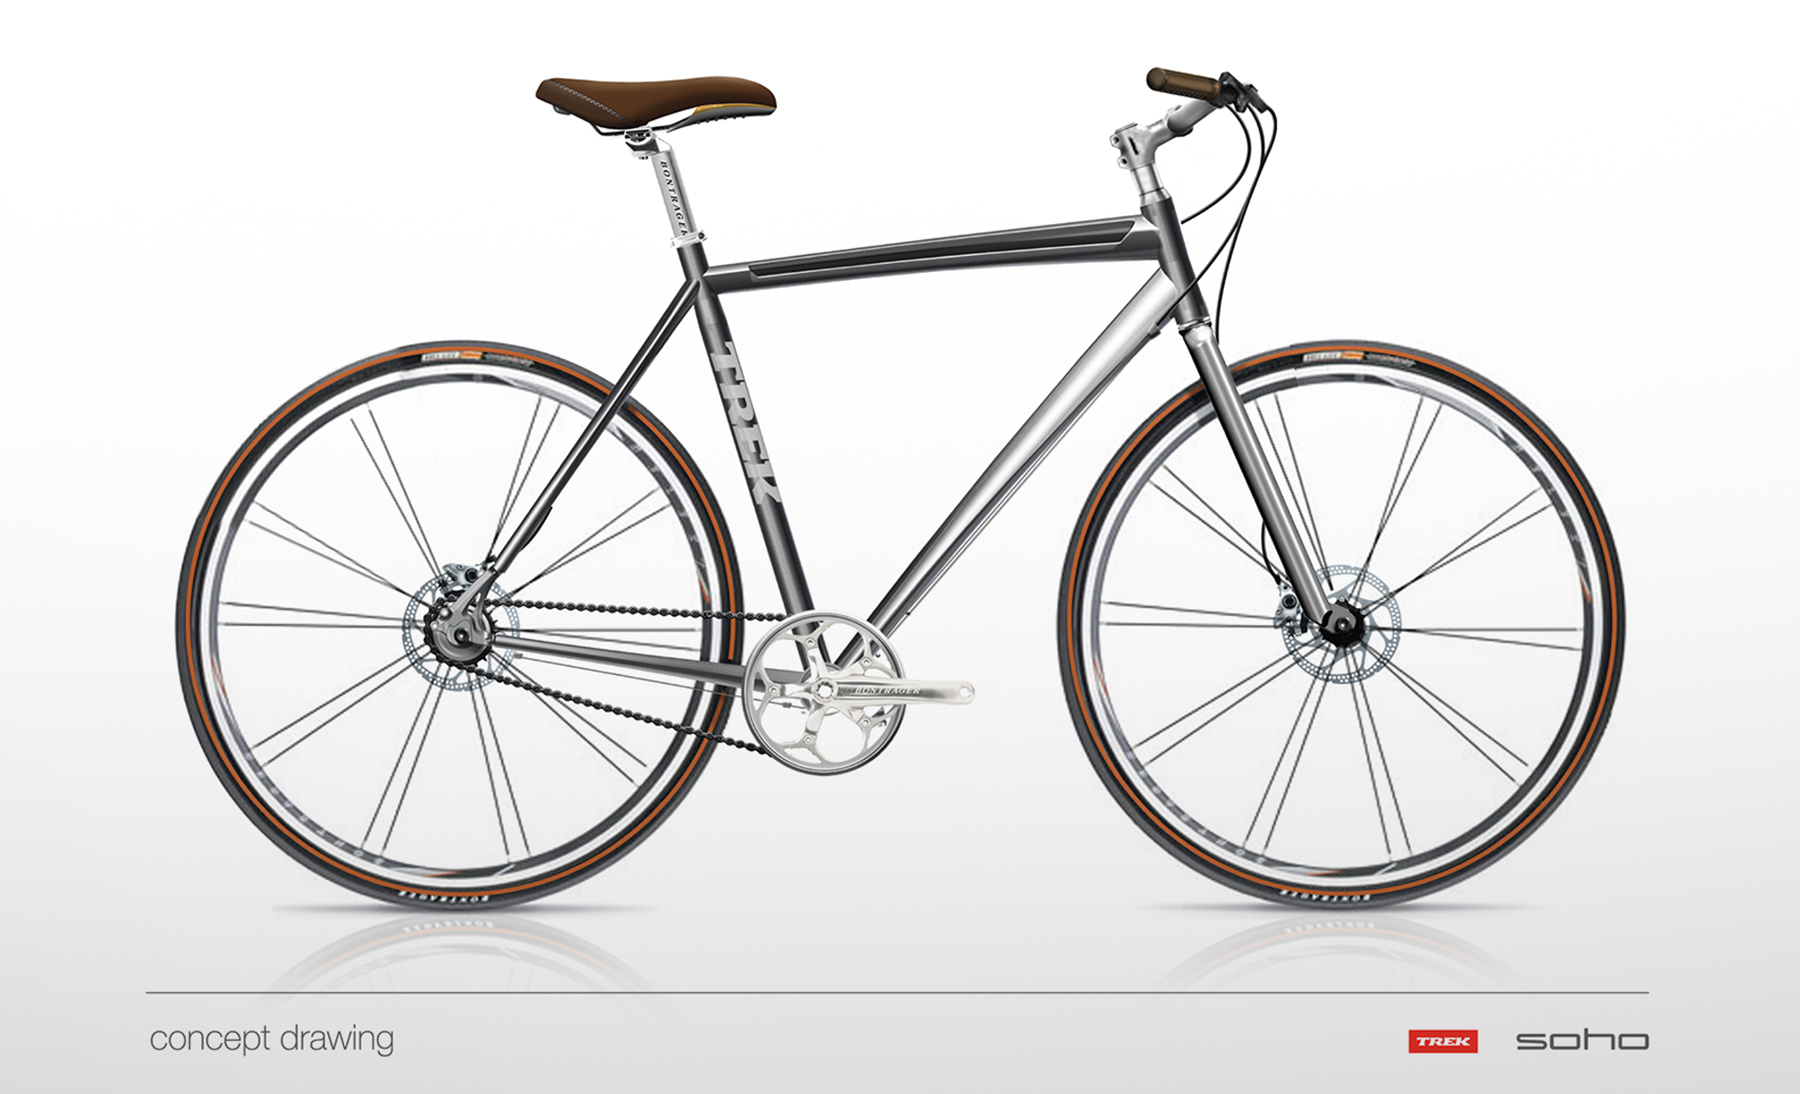 Trek Soho - Commuter Bicycle, 2006 on Behance